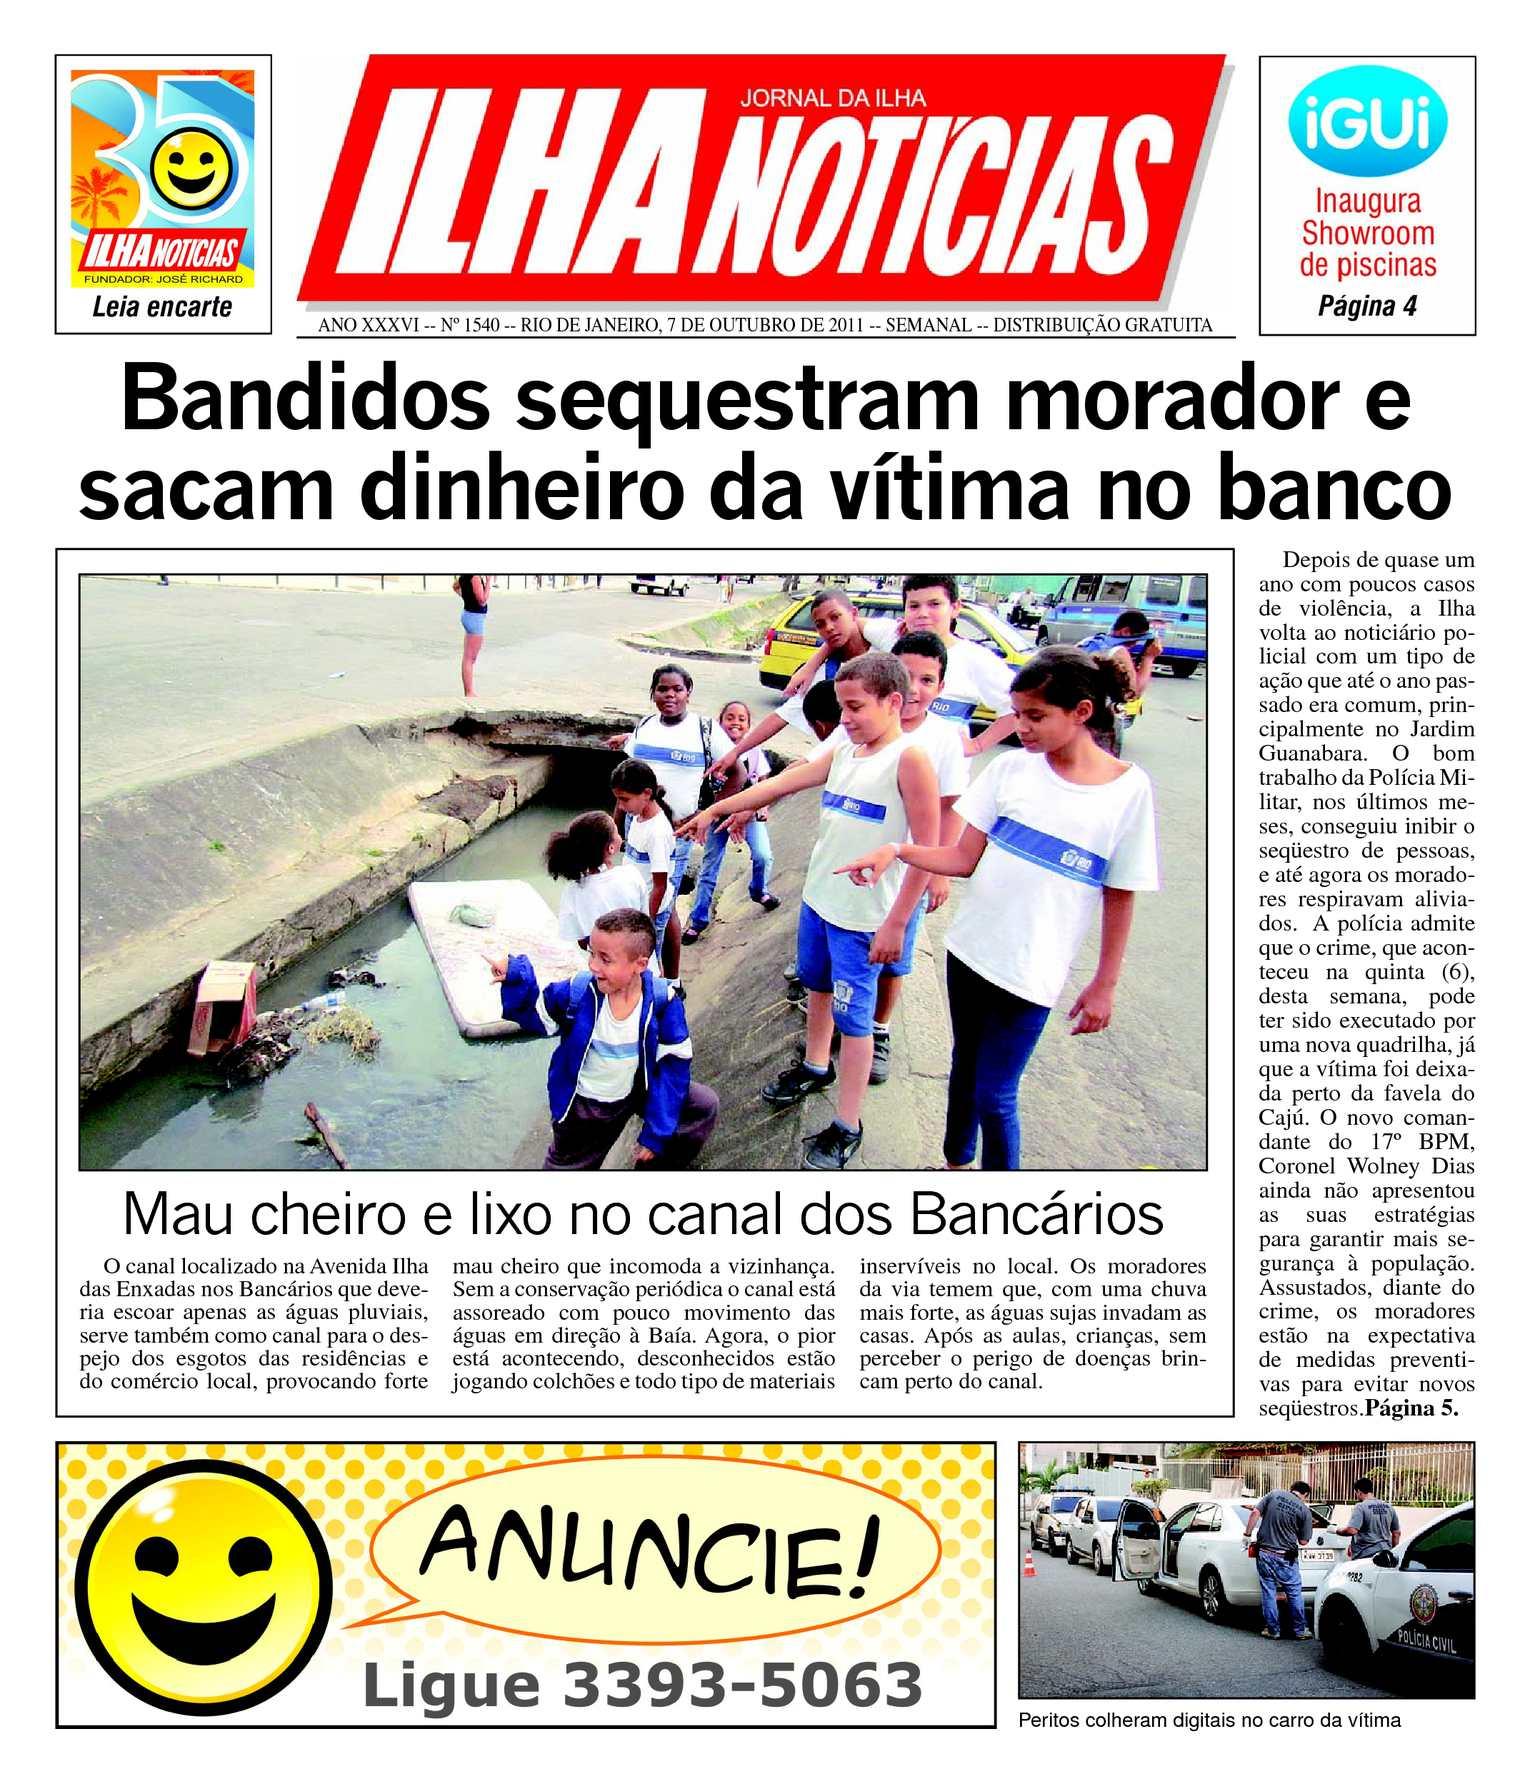 926ccaa5765 Calaméo - Jornal Ilha Notícias - Edição 1540 - 07 10 2011